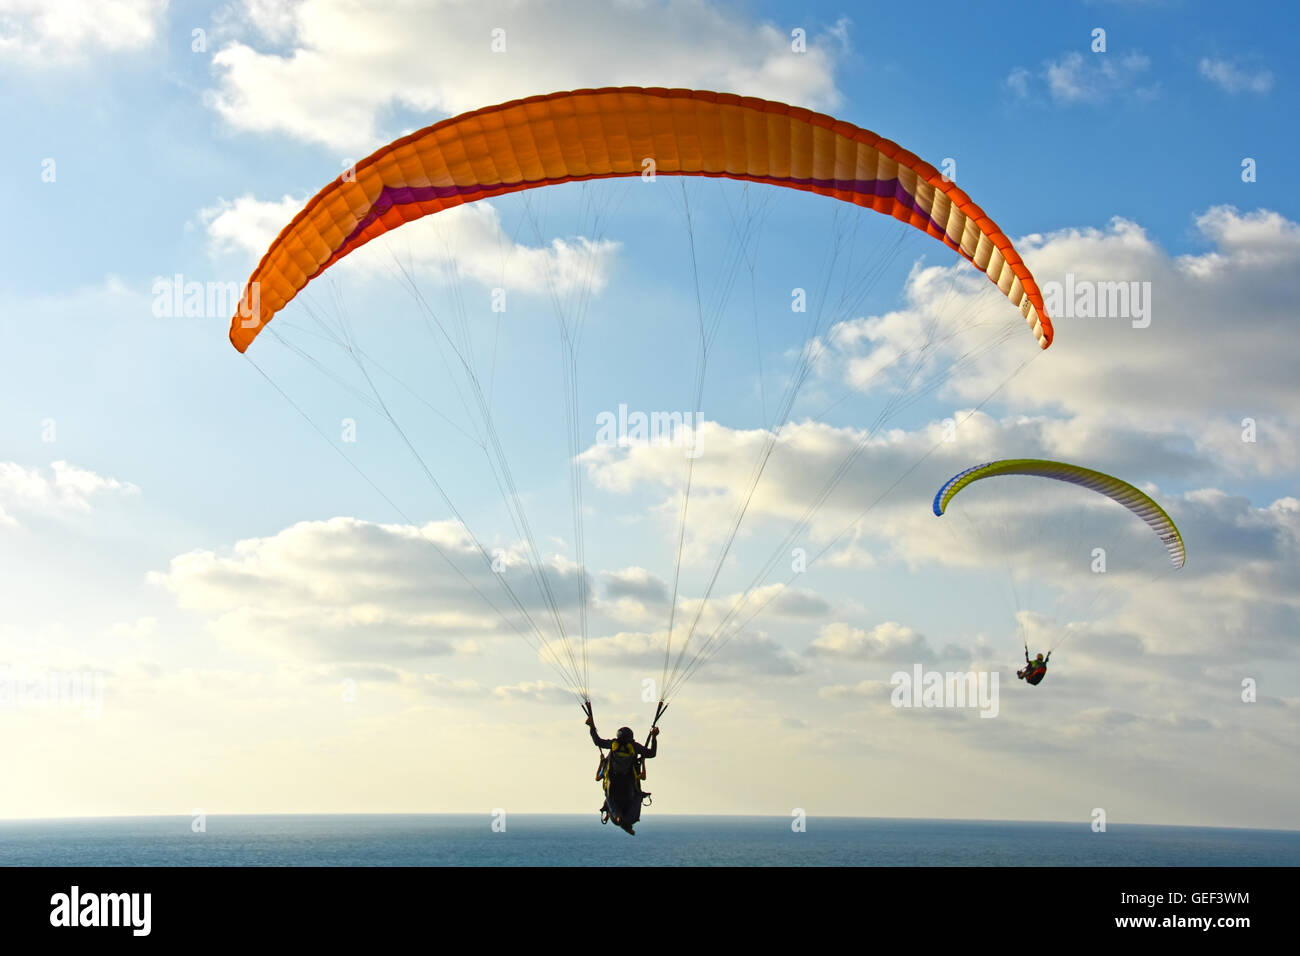 Para-gliding over the Mediterranean sea - Stock Image